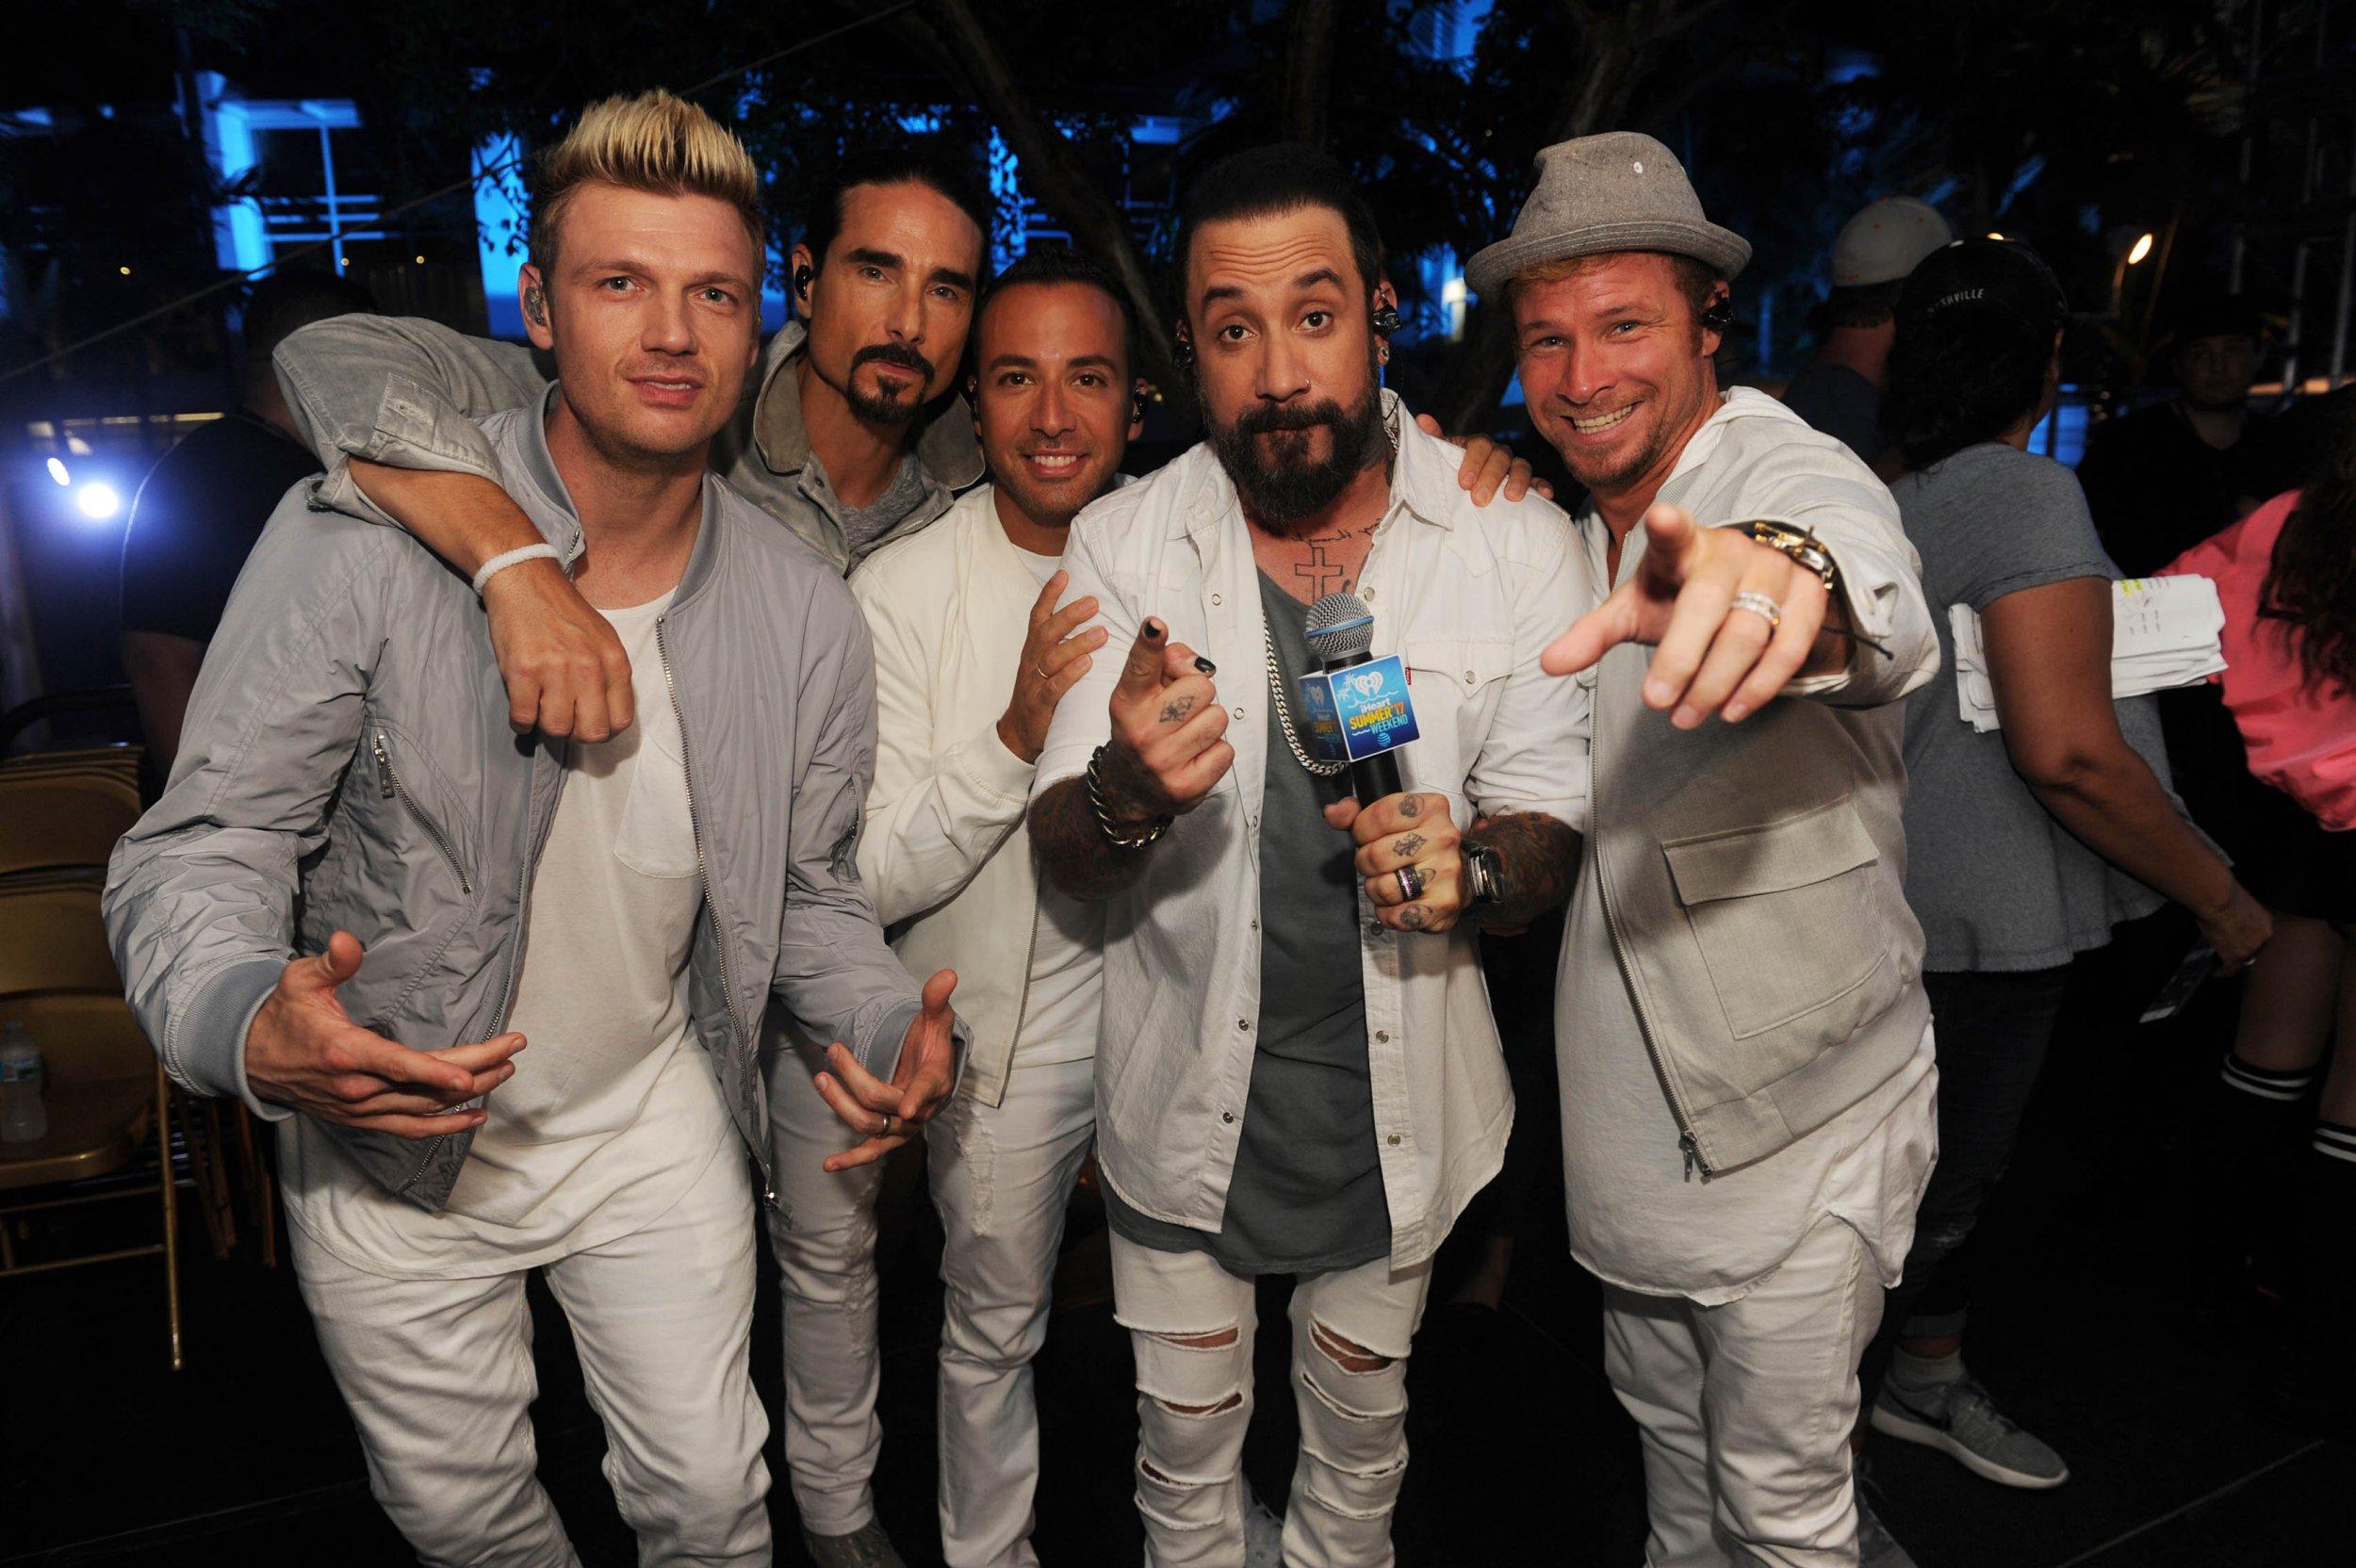 Mandatory Credit: Photo by Startraks/REX/Shutterstock (8862915p) Backstreet Boys iHeartSummer '17 Weekend, Day Two, Miami, USA - 10 Jun 2017 iHeartSummer '17 Weekend.